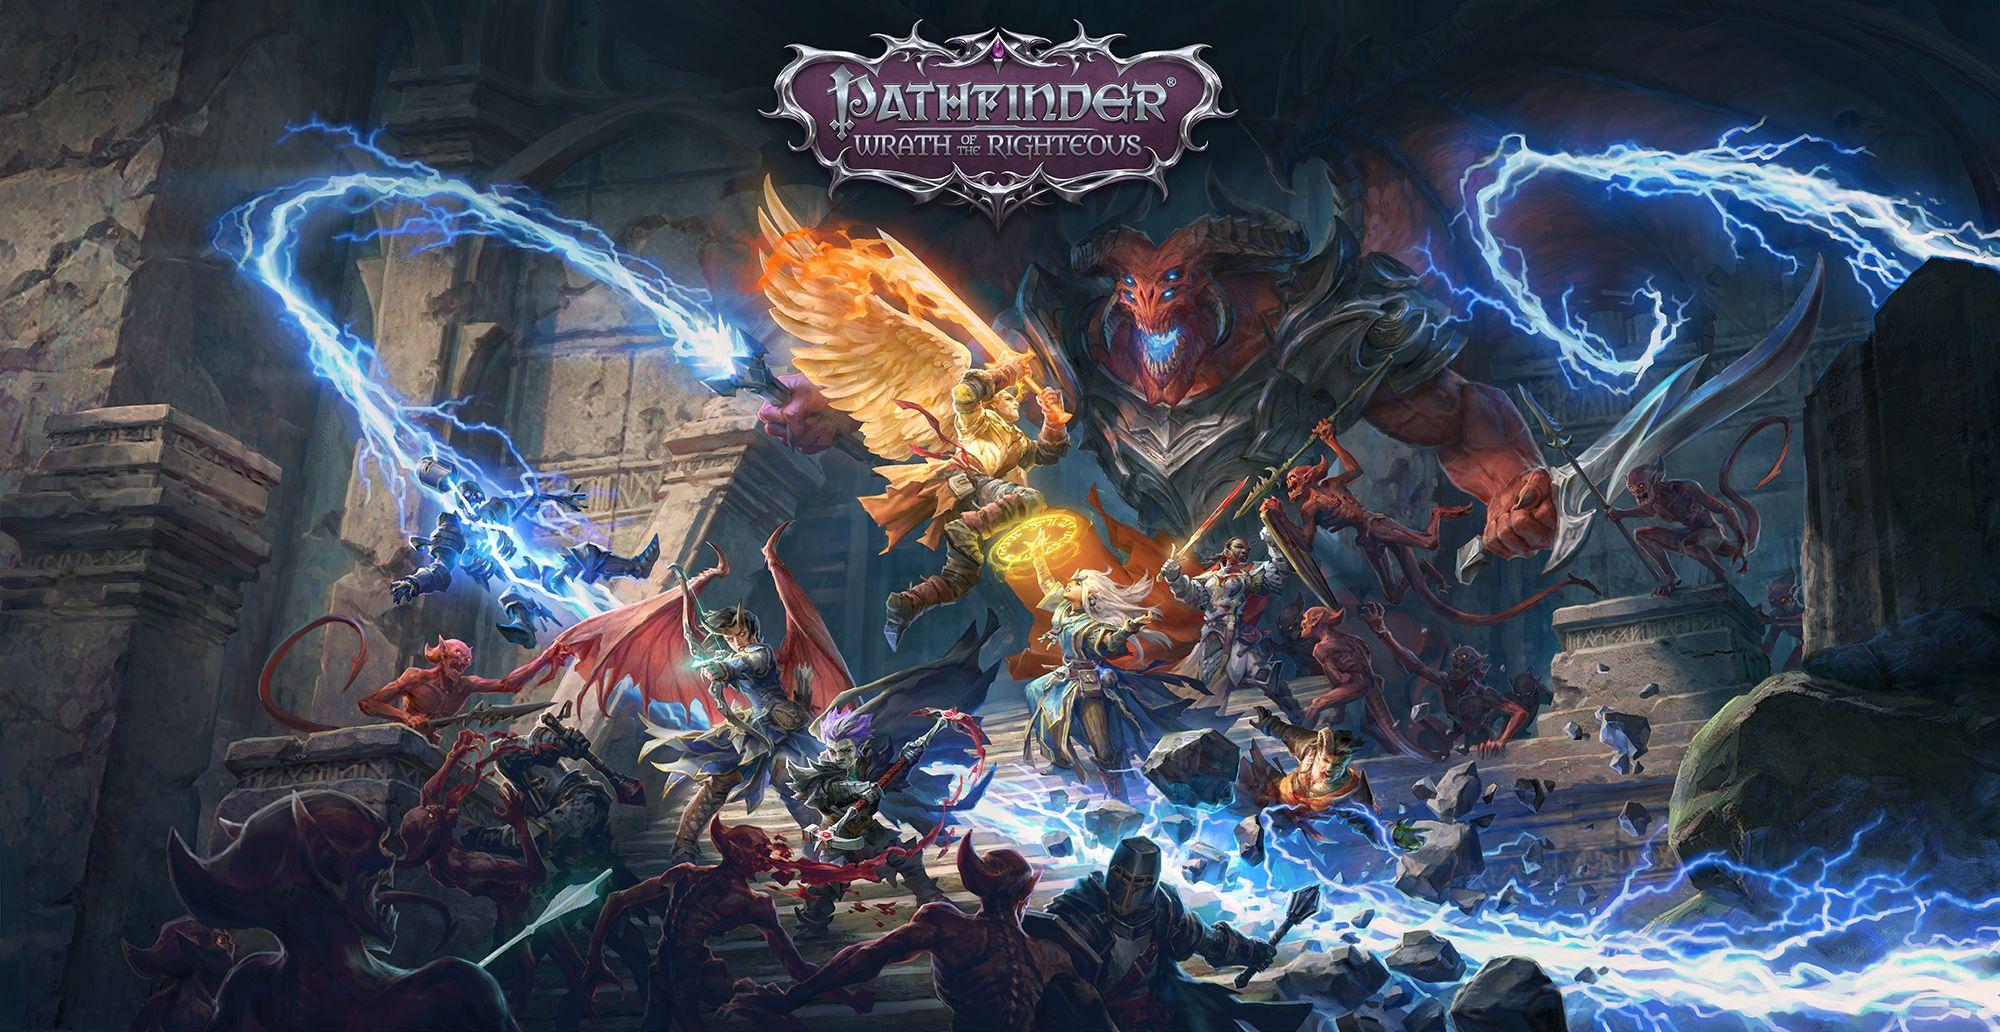 Krenula Kickstarter kampanja za Pathfinder: Wrath of the Righteous